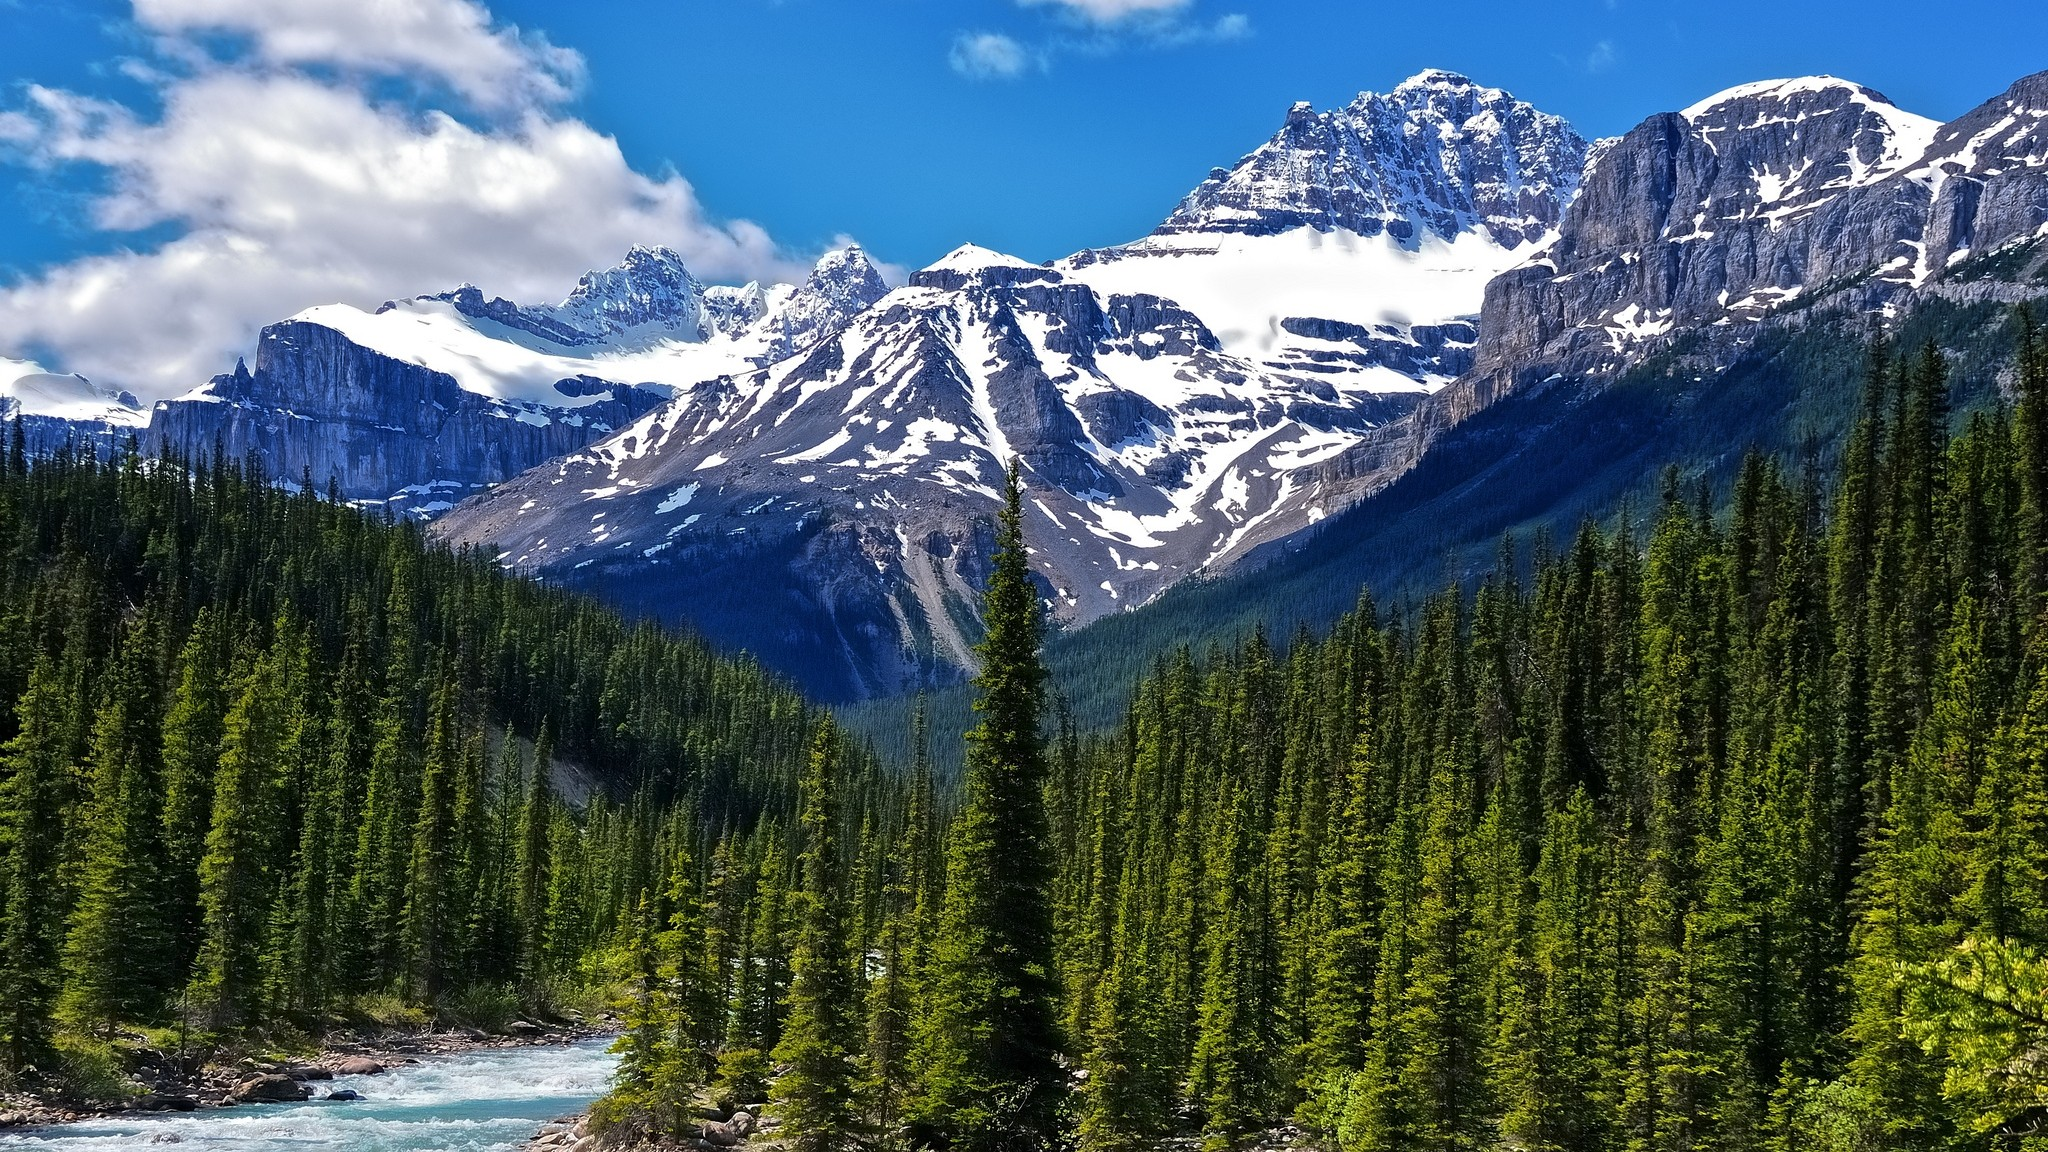 Red Mountain, Uncompahgre National Forest, Colorado  № 1563872 бесплатно